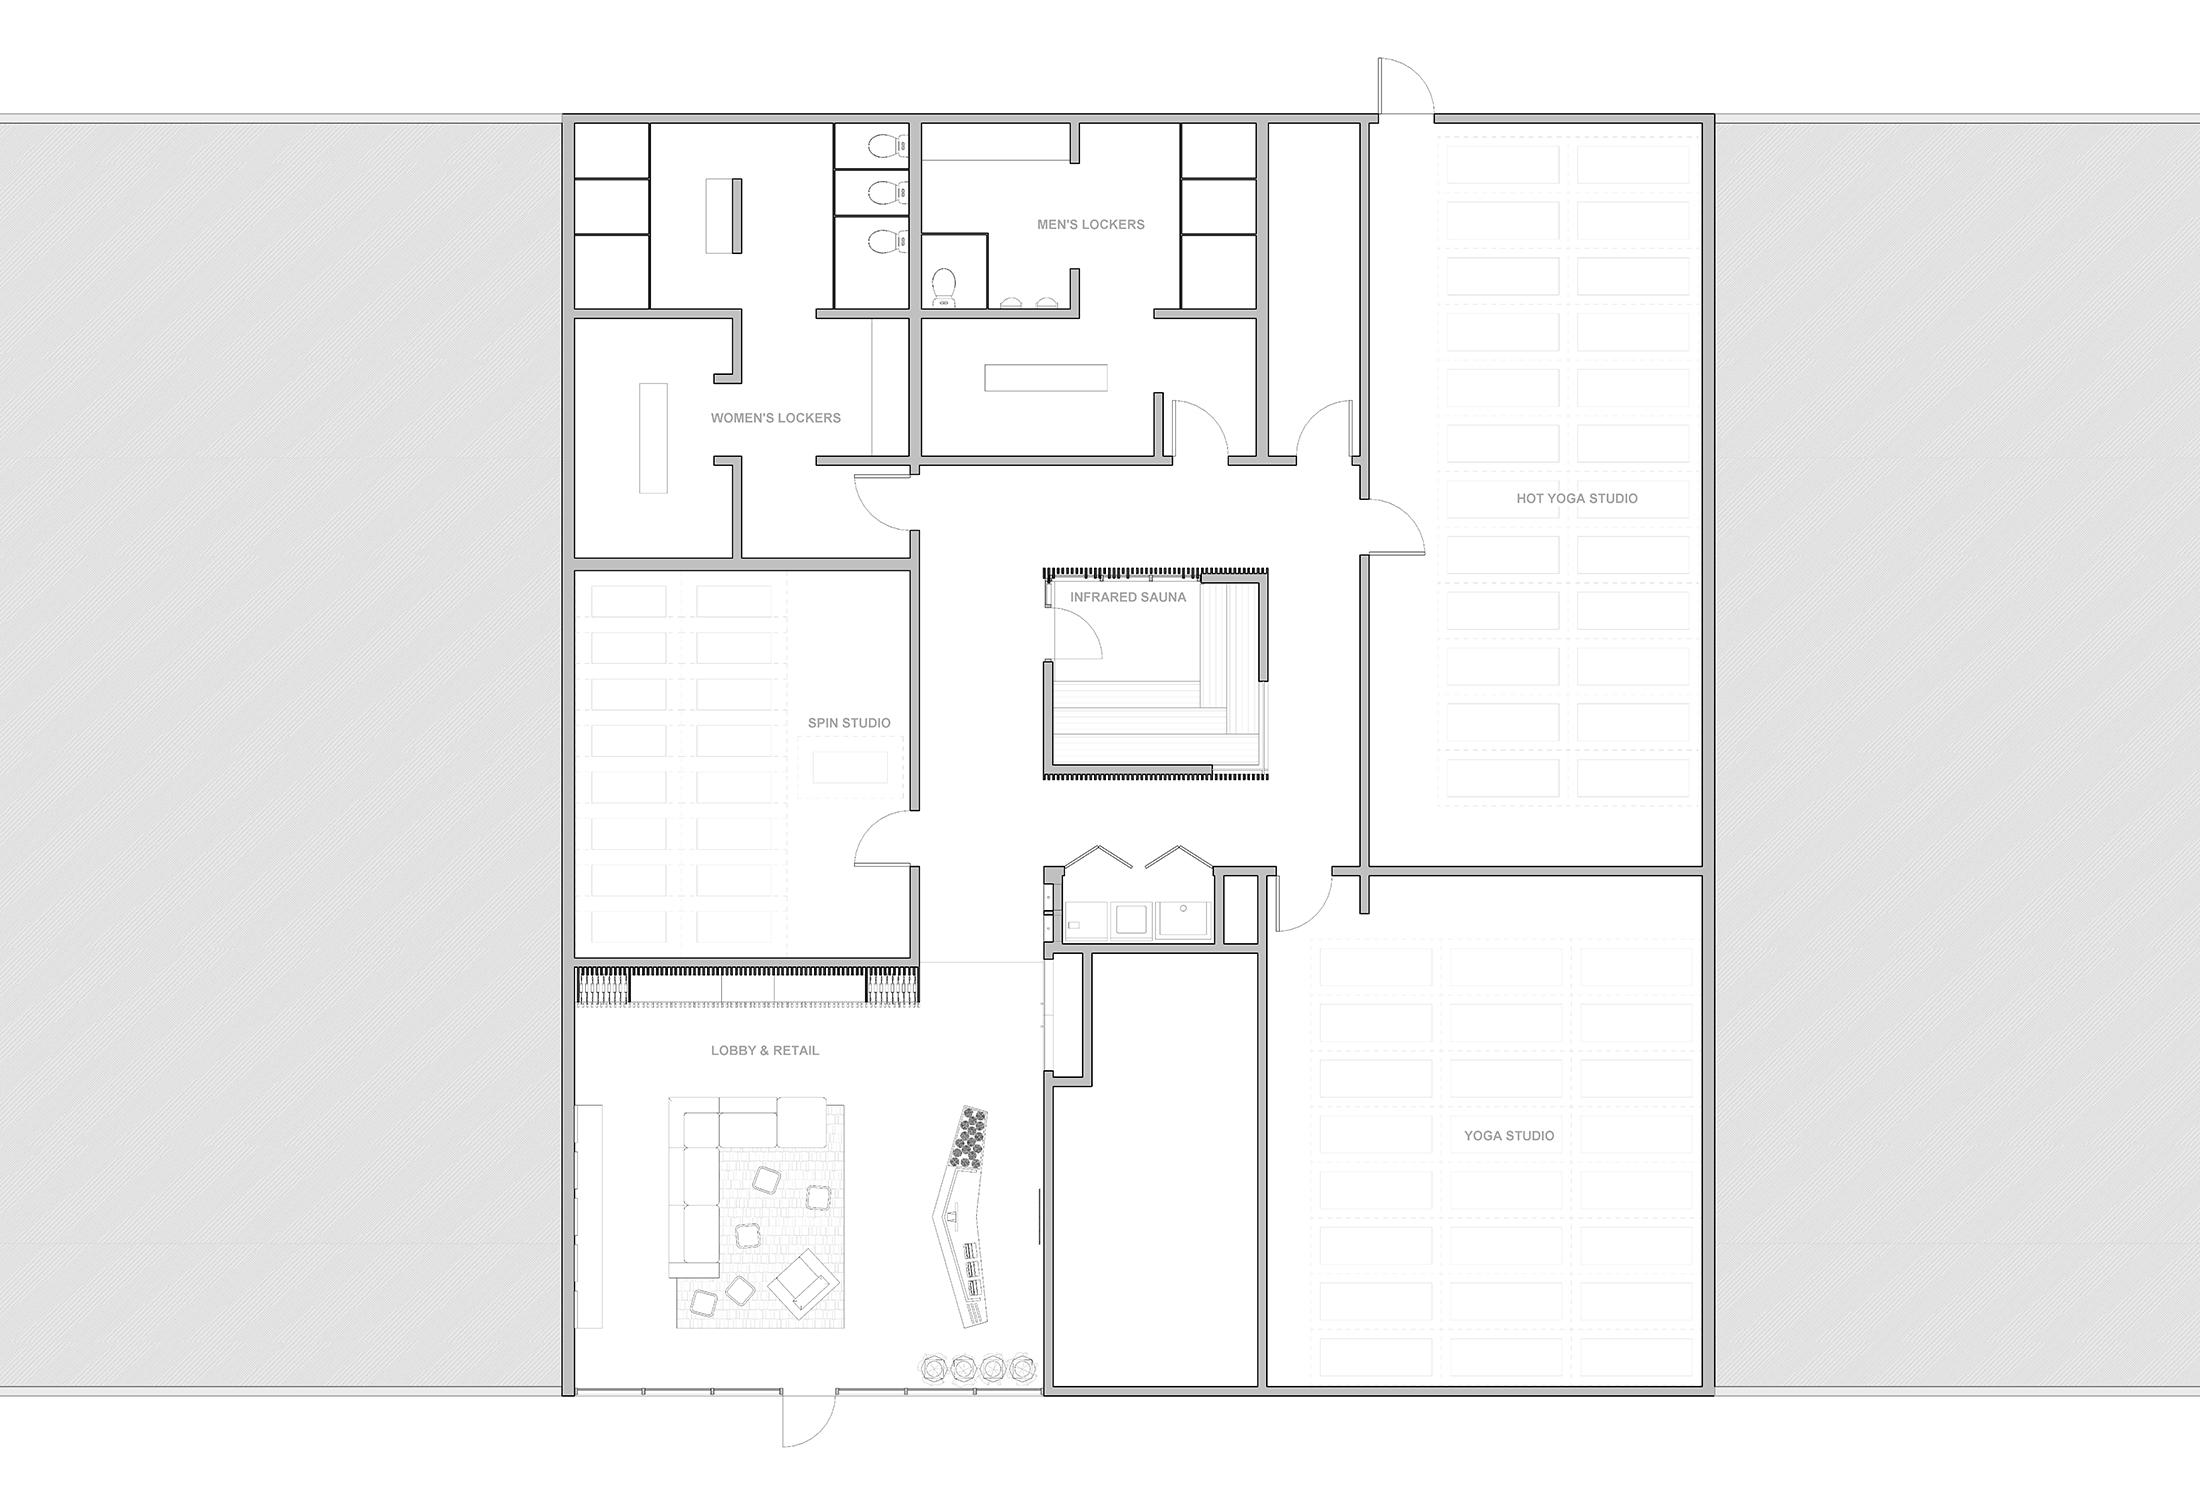 Alberta Hot Yoga Studio Propel Studio Architecture Portland Oregon